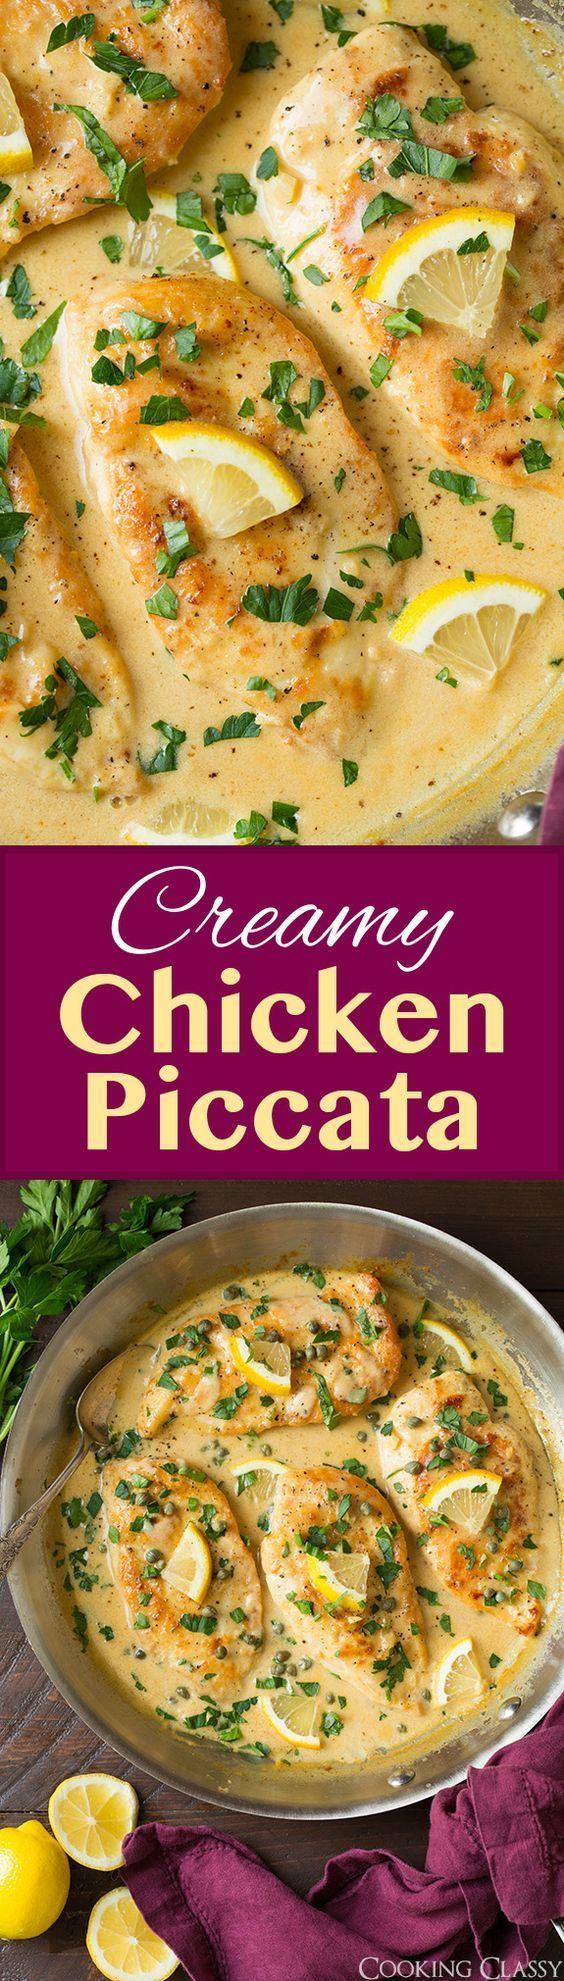 Creamy Chicken Piccata - this is my FAVORITE chicken piccata recipe! Unbelievably delicious! Love the addition of cream.: